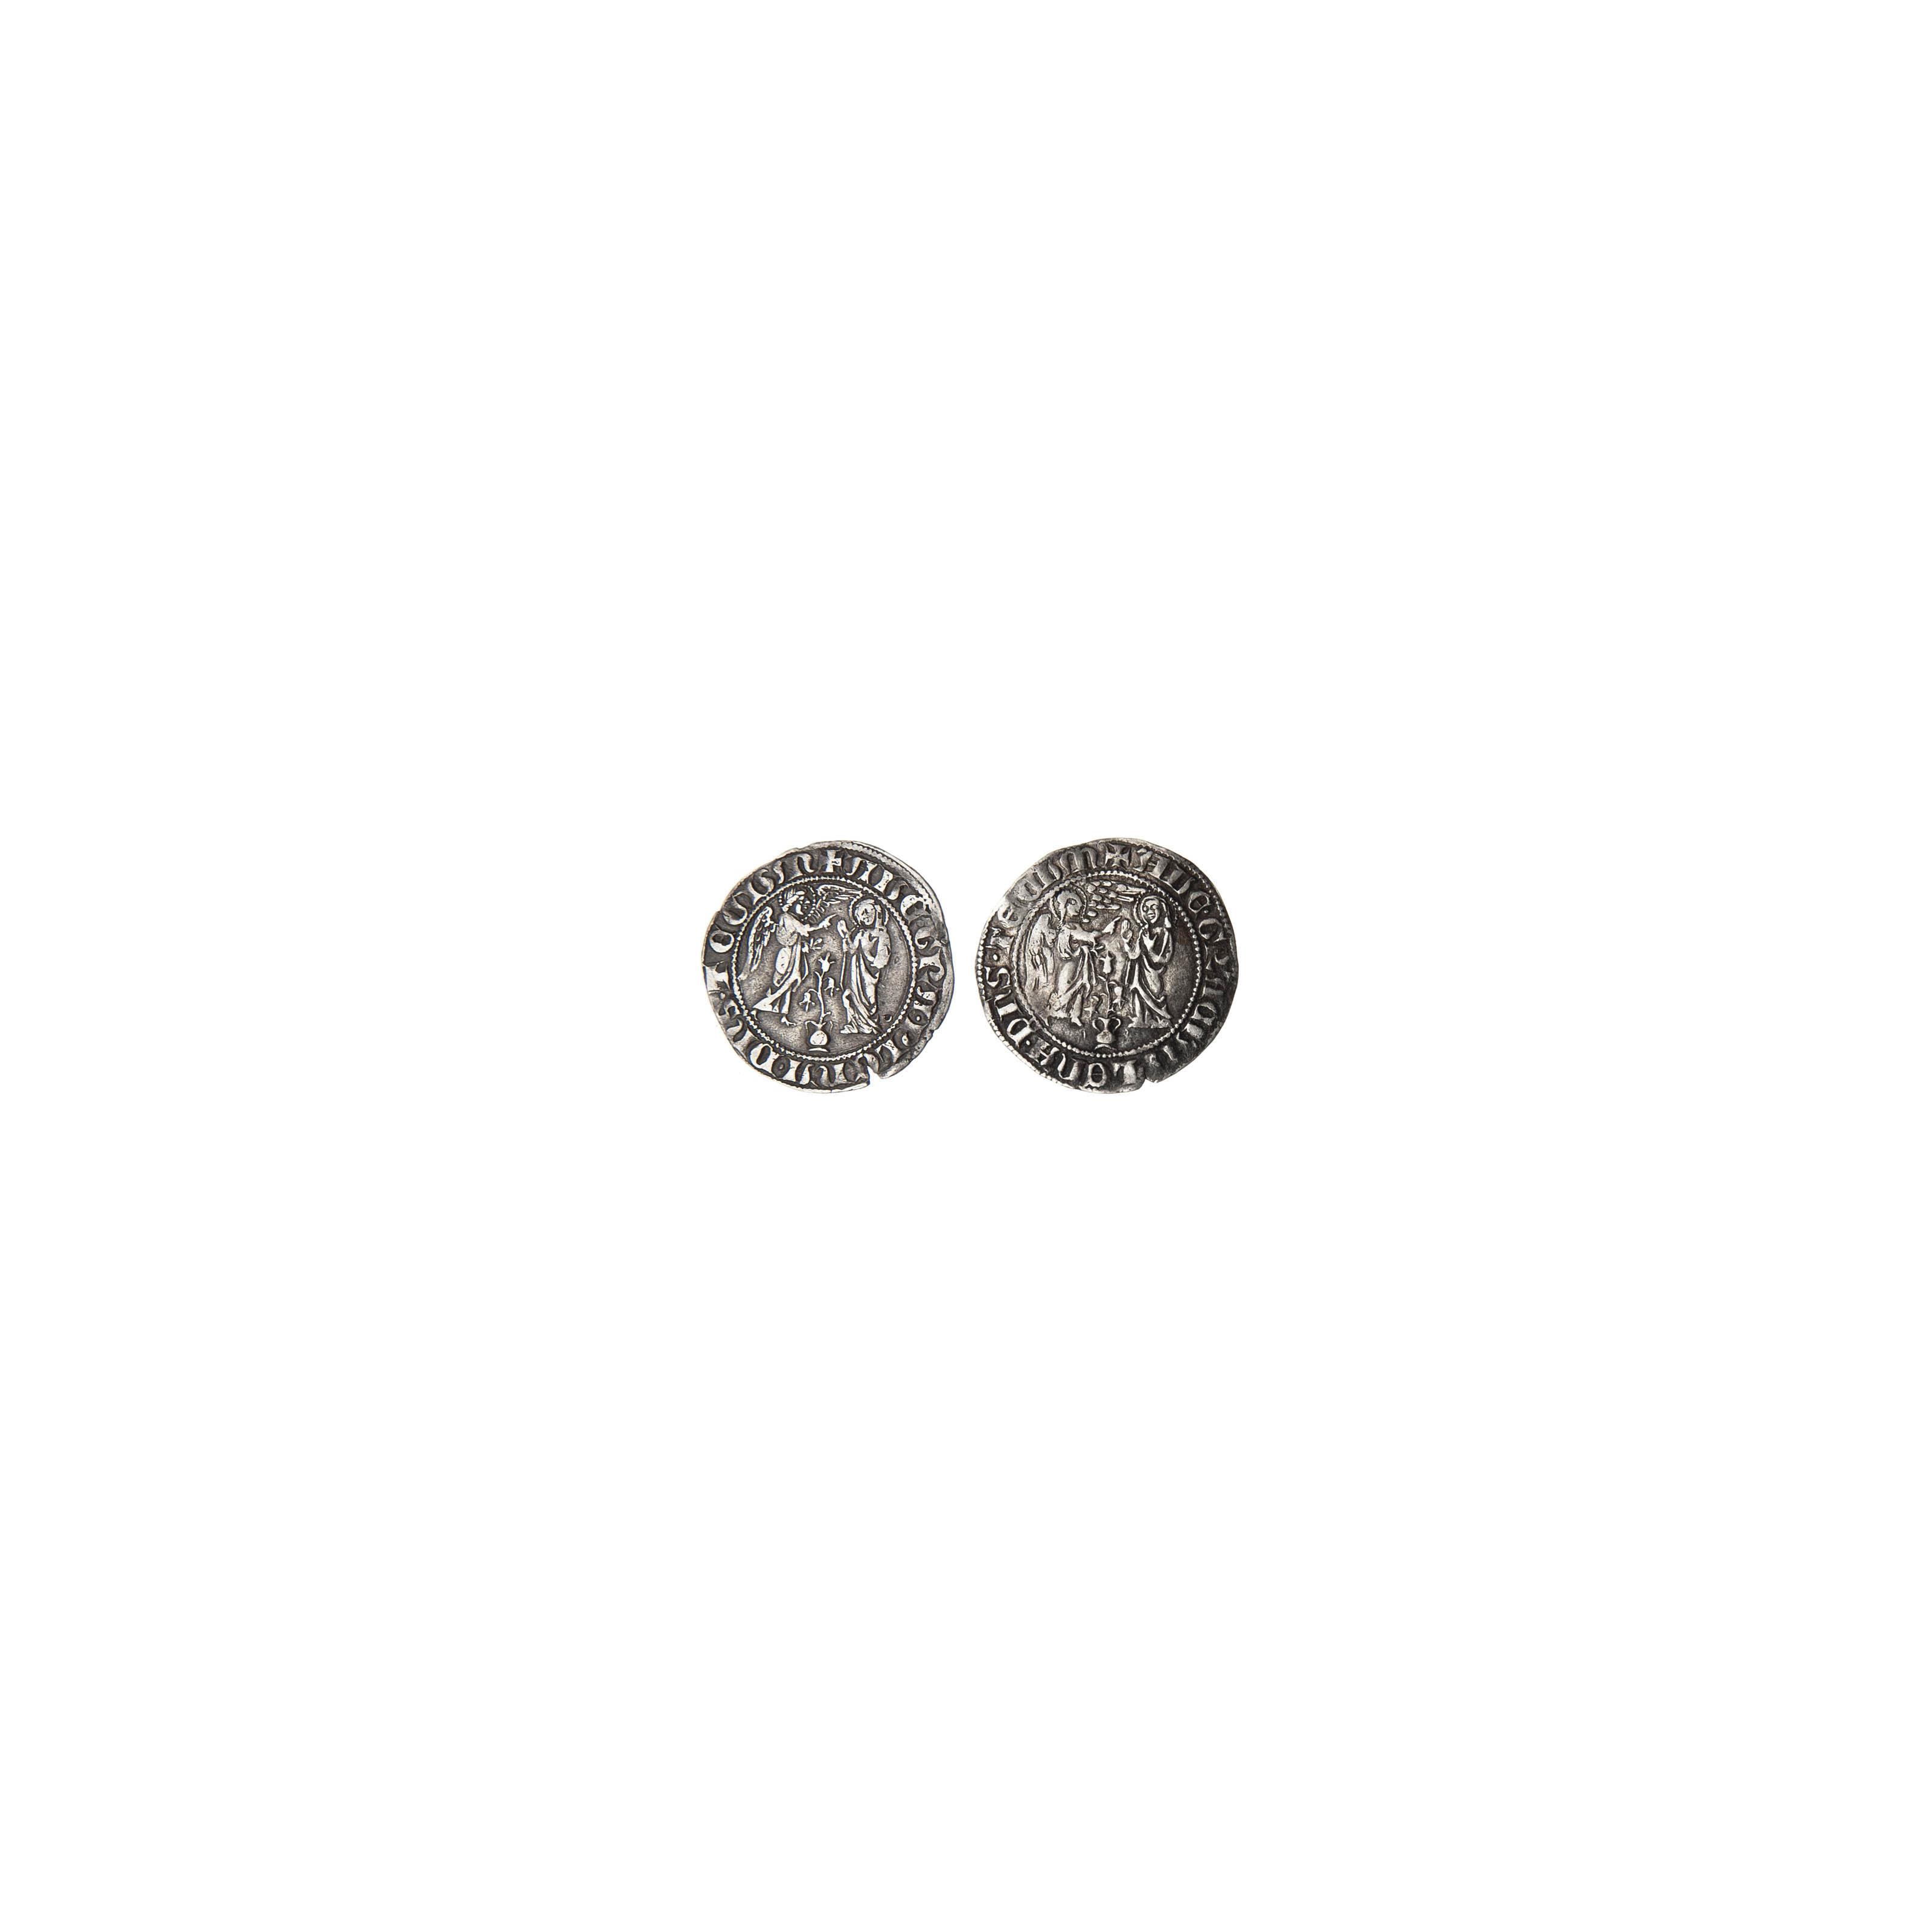 Napoli, Carlo I d'Angiò (1266-85), Saluto d'argento, AR 3.147g (MEC.677-678; MIR.20), Carlo II d'Angiò (1285-1309), Saluto d'argento, AR 3.252g (MEC.683-4; MIR.23), BB (2 pezzi)  (2)